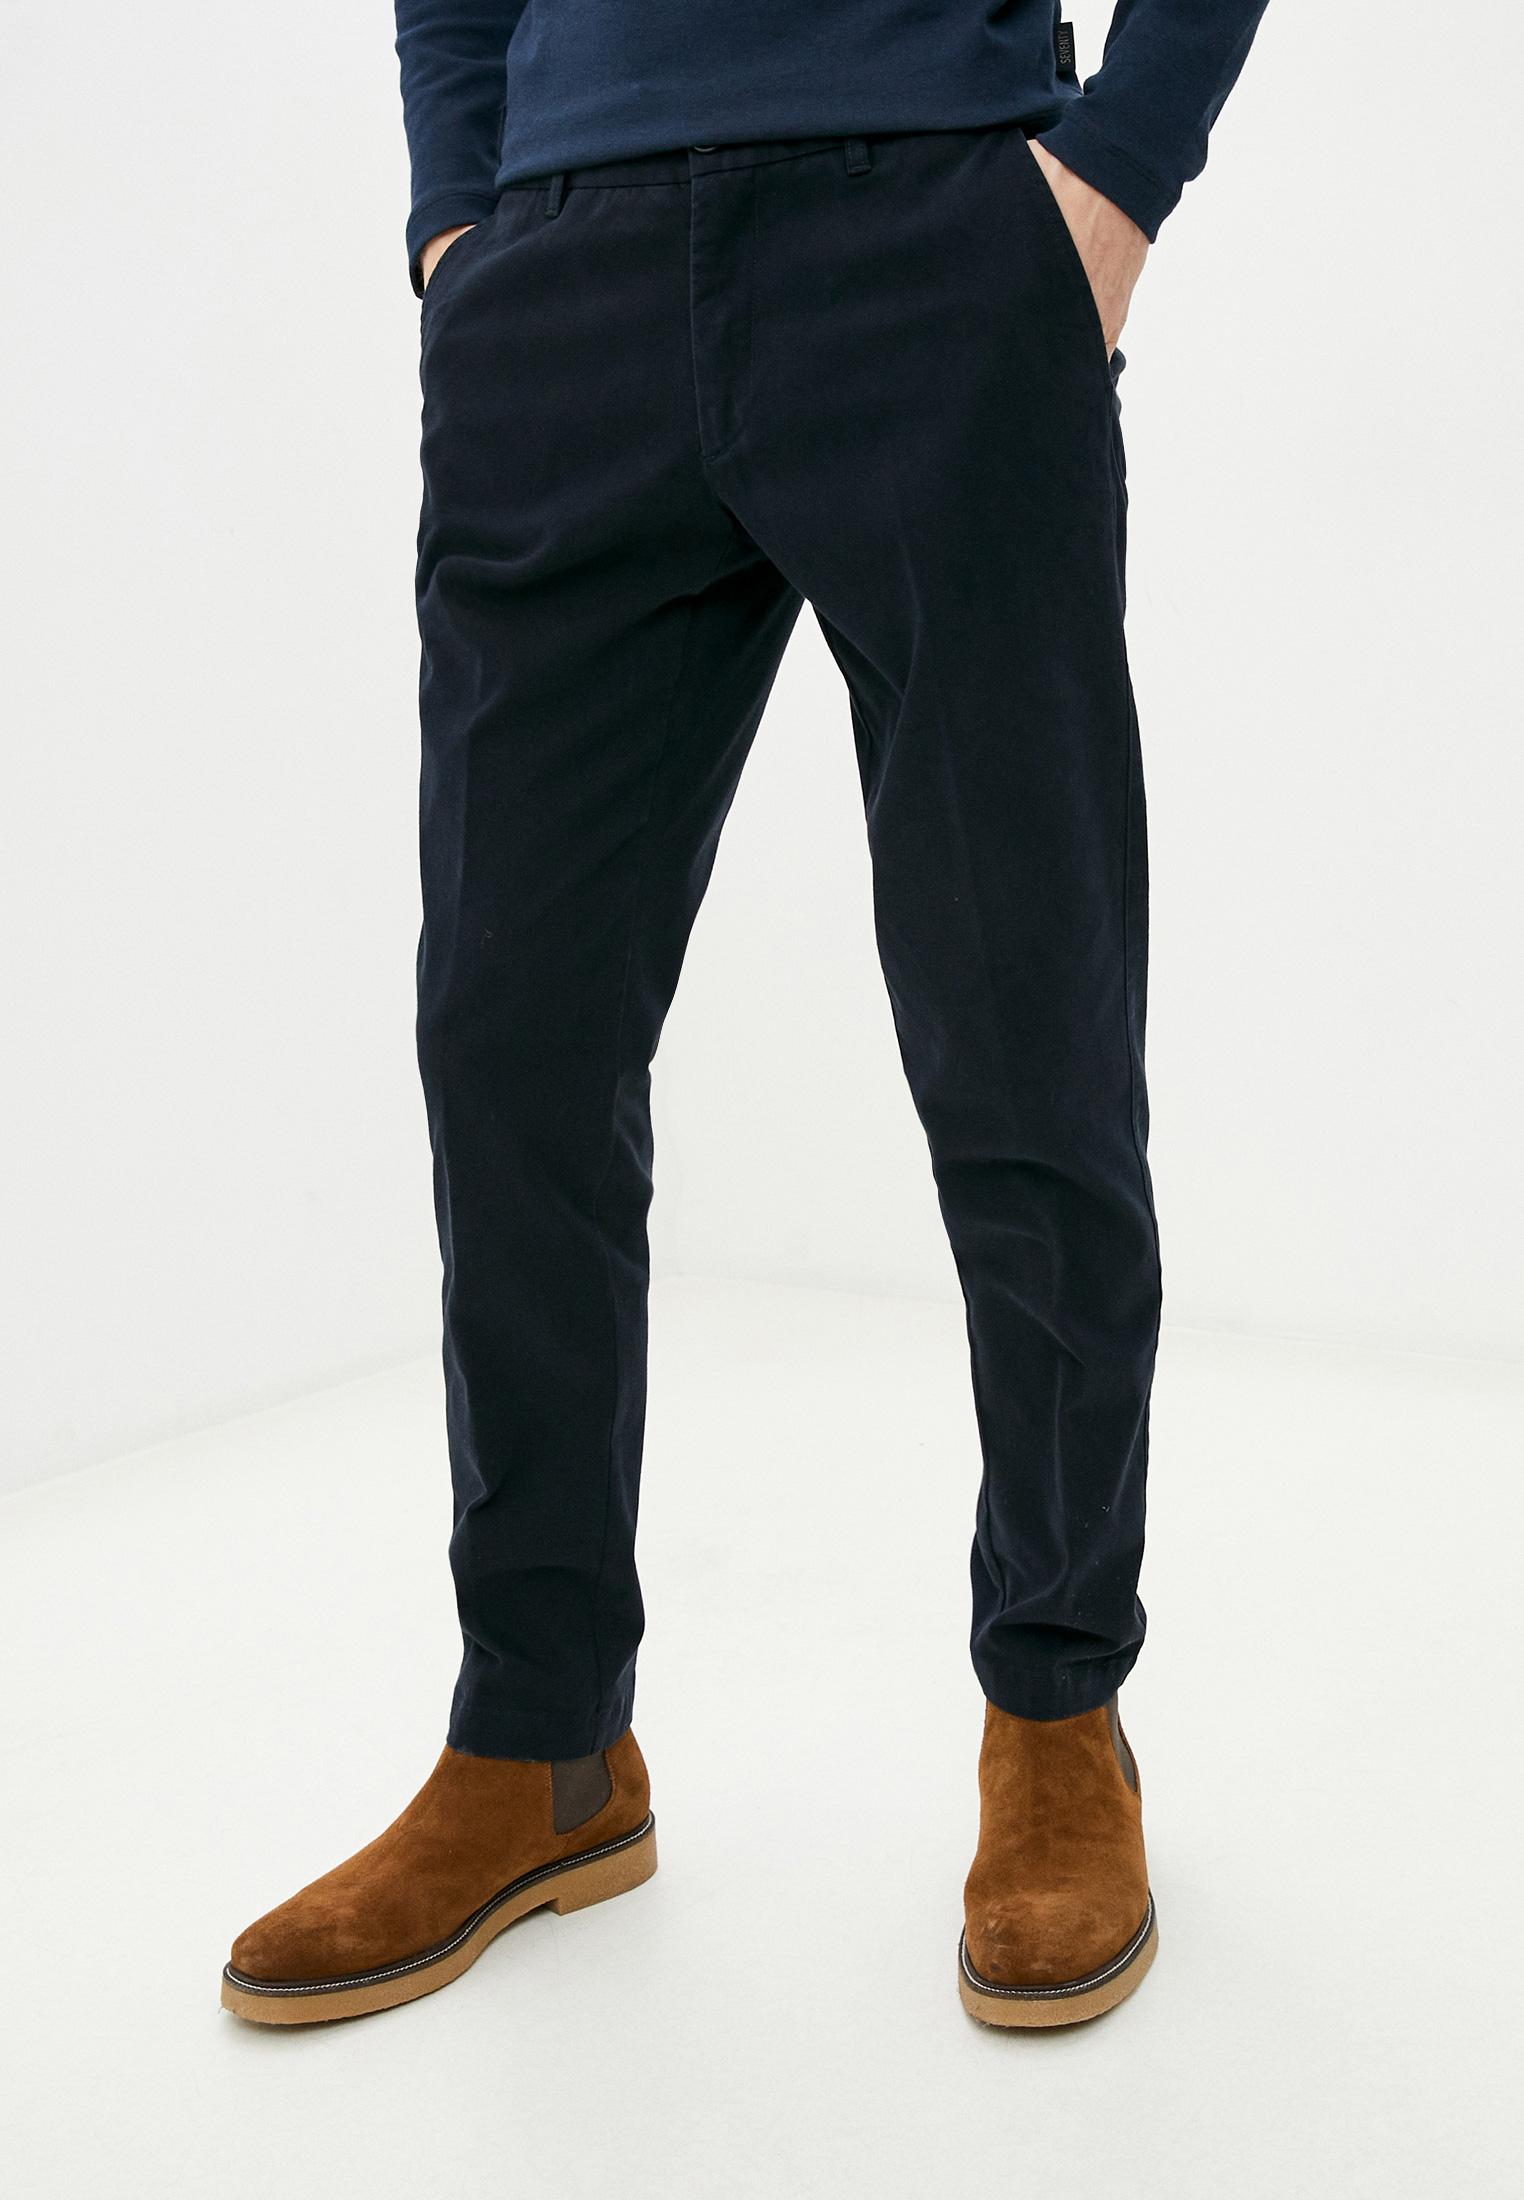 Мужские повседневные брюки Bikkembergs (Биккембергс) C P 027 00 S 3154